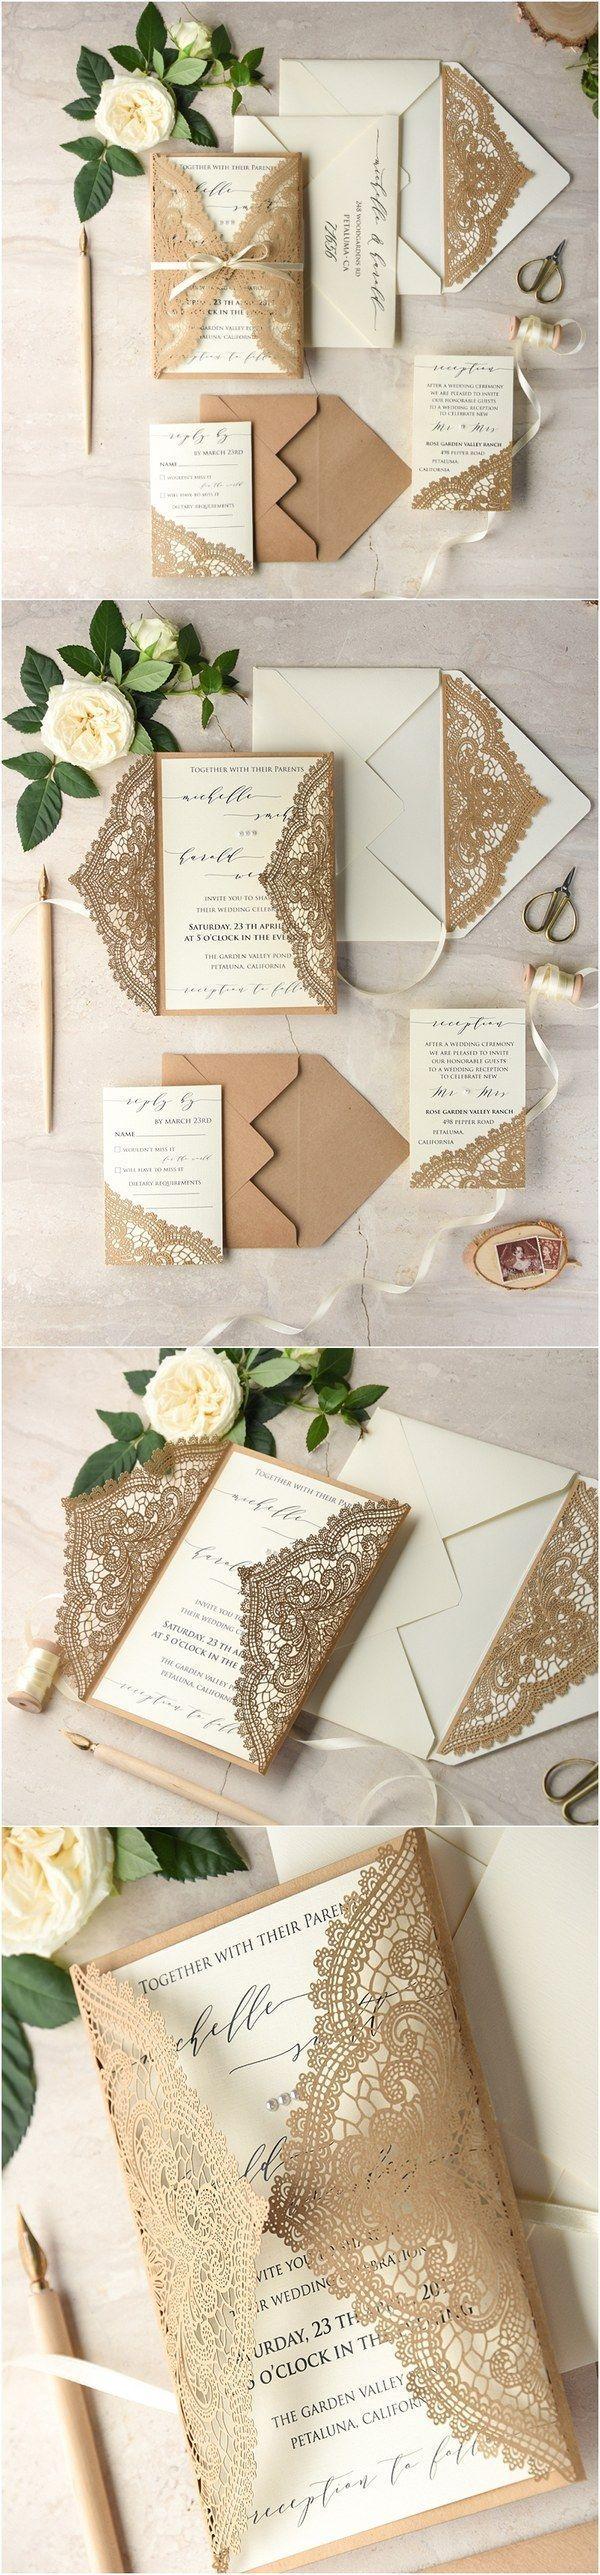 wedding invitation templates for muslim%0A Ivory kraft paper laser cut lace rustic wedding invitations   lCNz    http   www